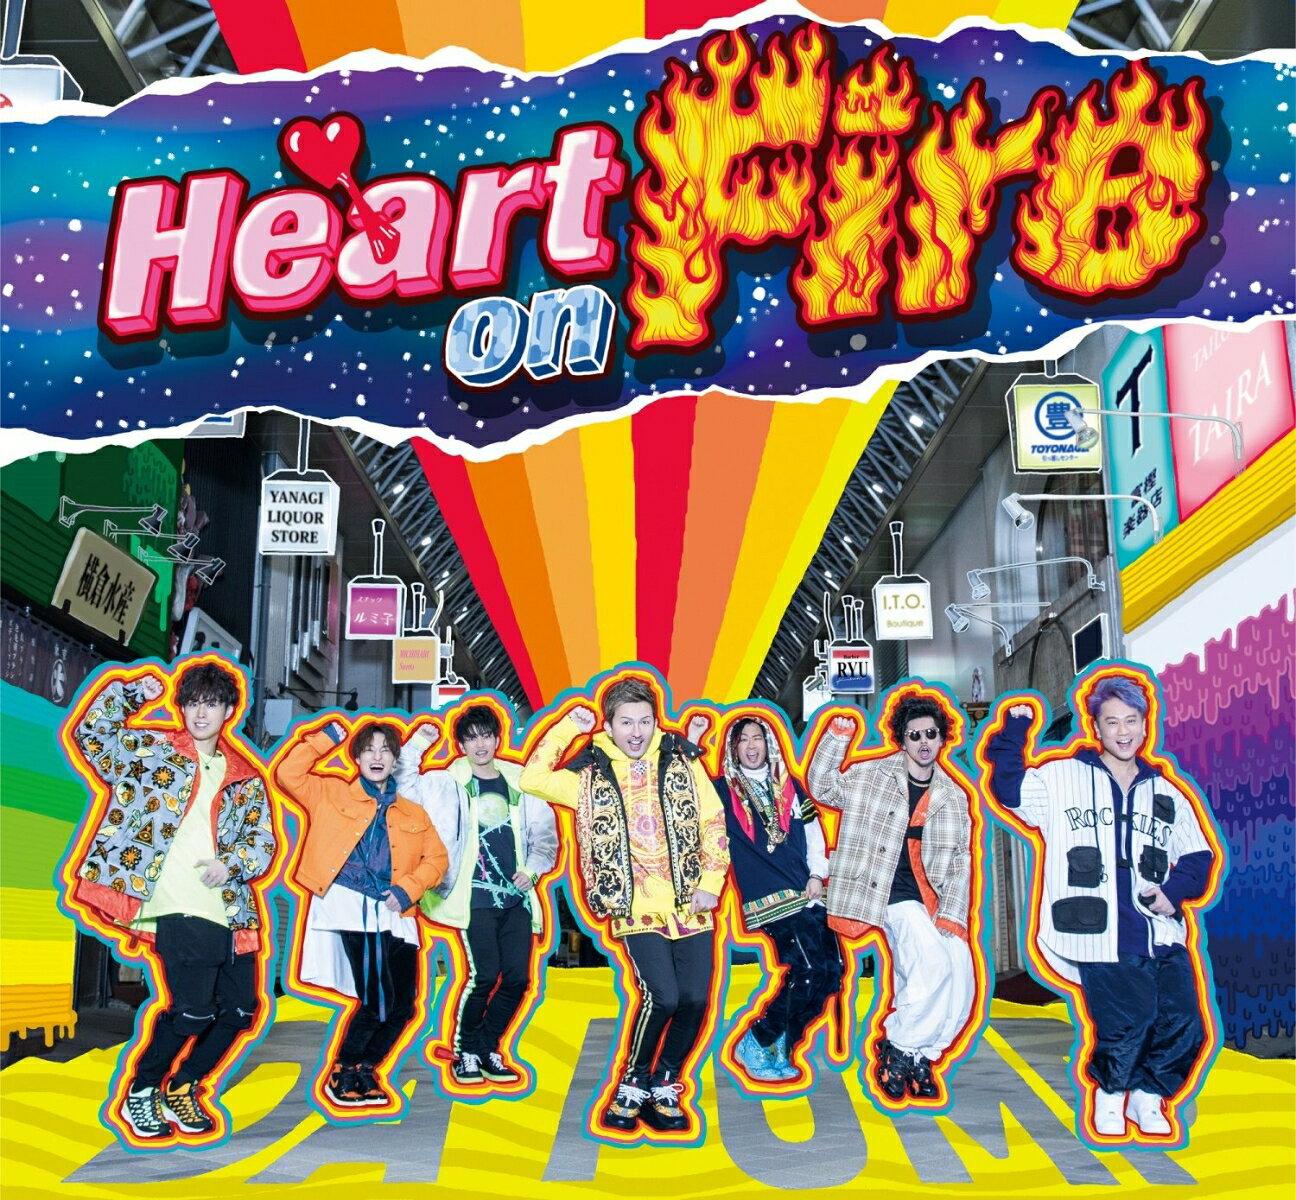 Heart on Fire (初回限定盤 CD+DVD+スマプラ+VR)画像